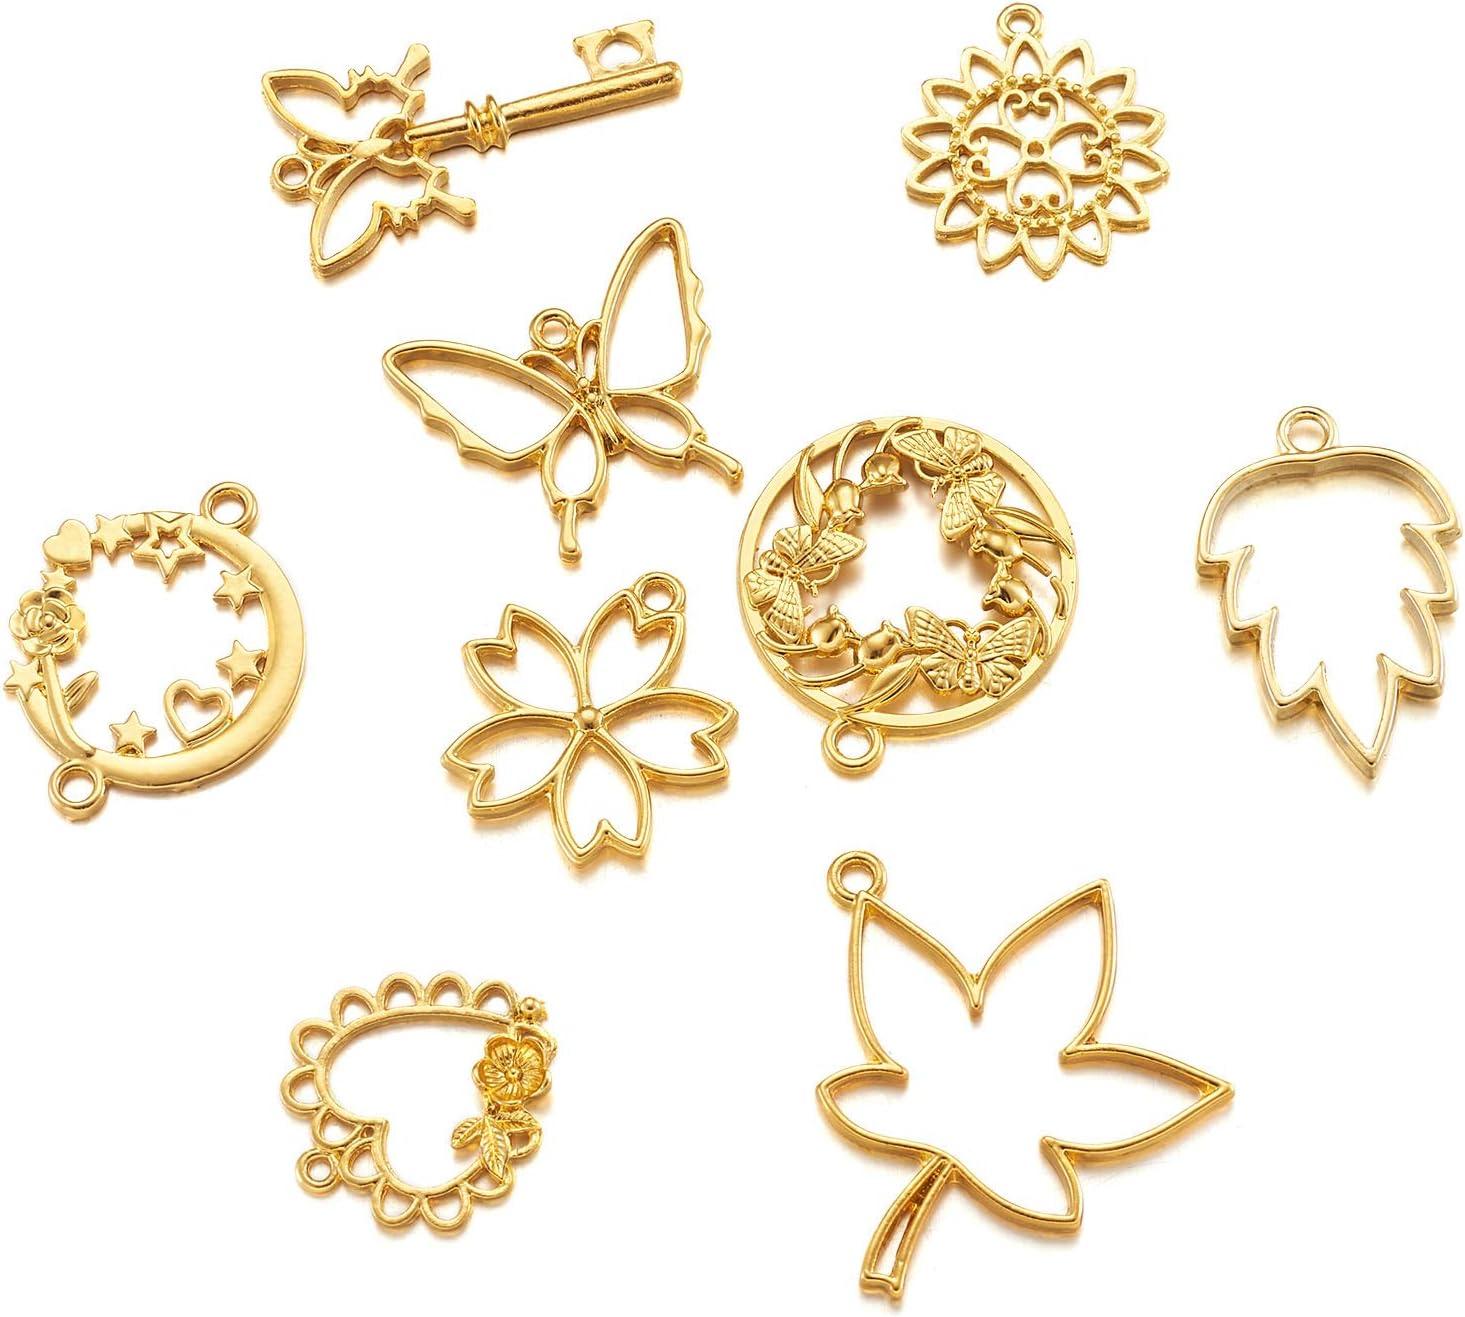 Pandahall 10pcs Antique Bronze Alloy Open Back Bezel Pendants 33.9x20.5mm Hollow Frame Pendant Blanks for DIY Epoxy Resin Pressed Flower Jewelry